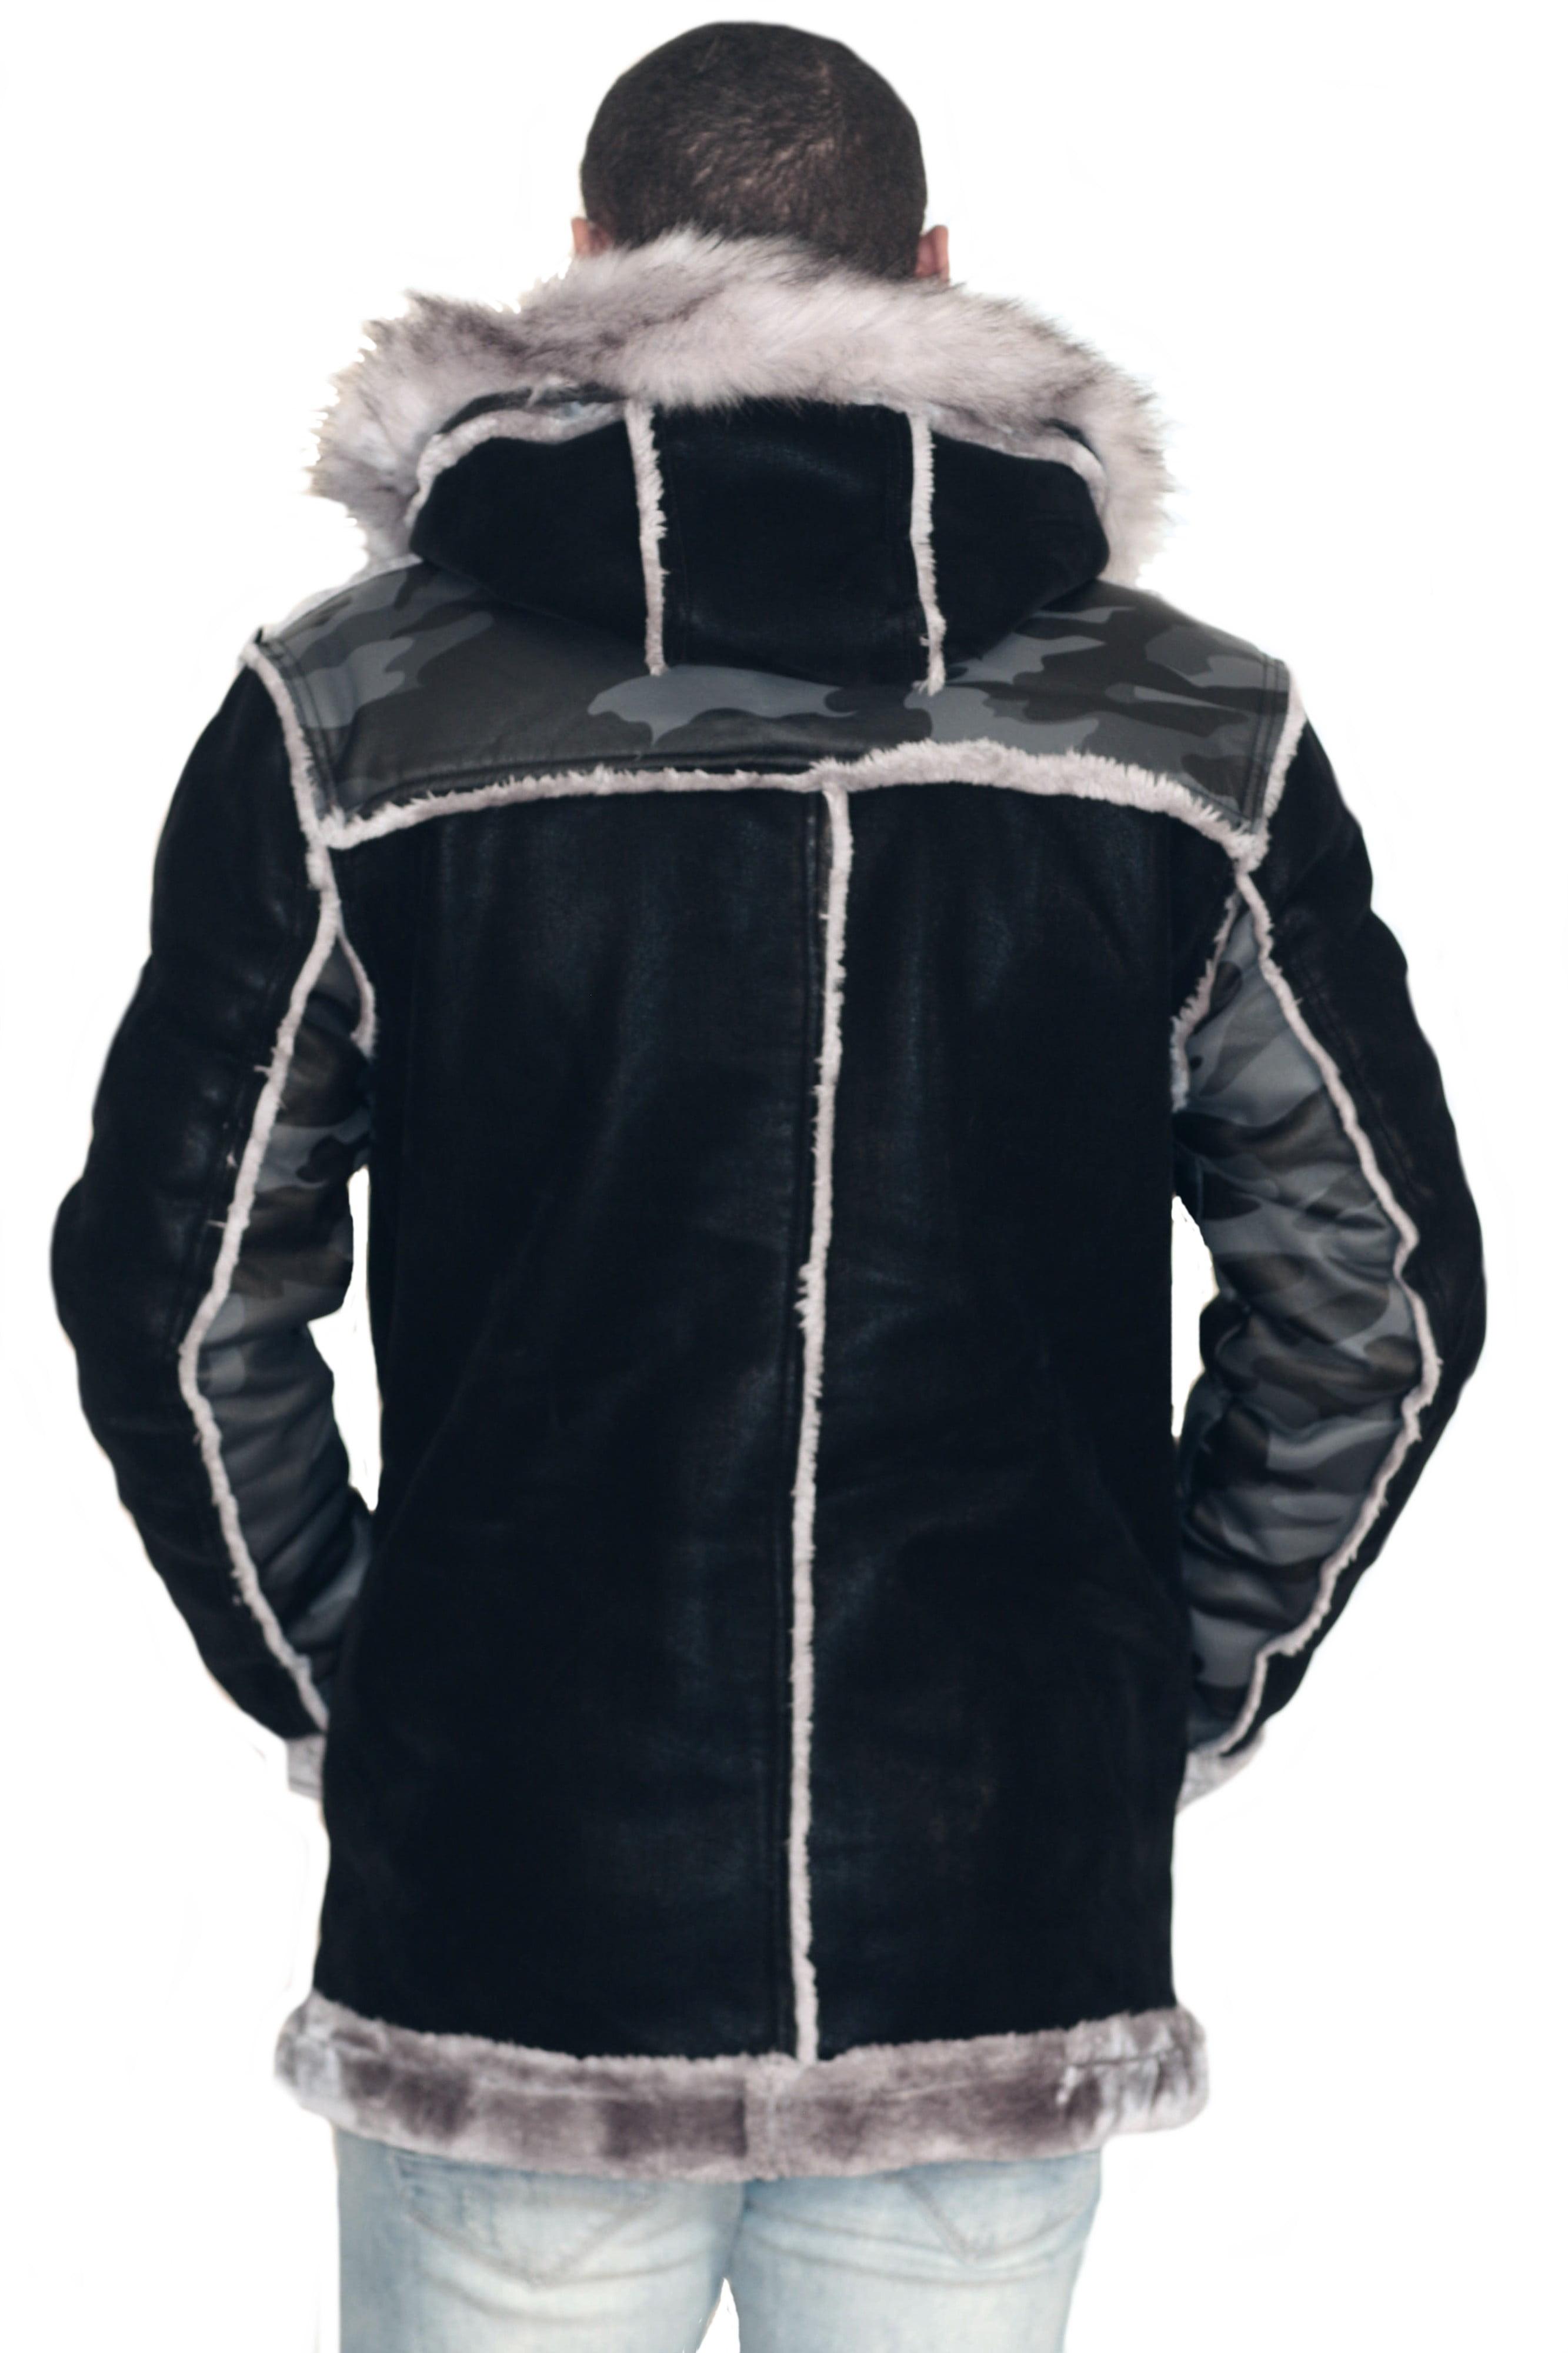 740d842bb1375 Jordan Craig - Jordan Craig Siberian Camouflage Shearling Jacket Black Camo  - Walmart.com